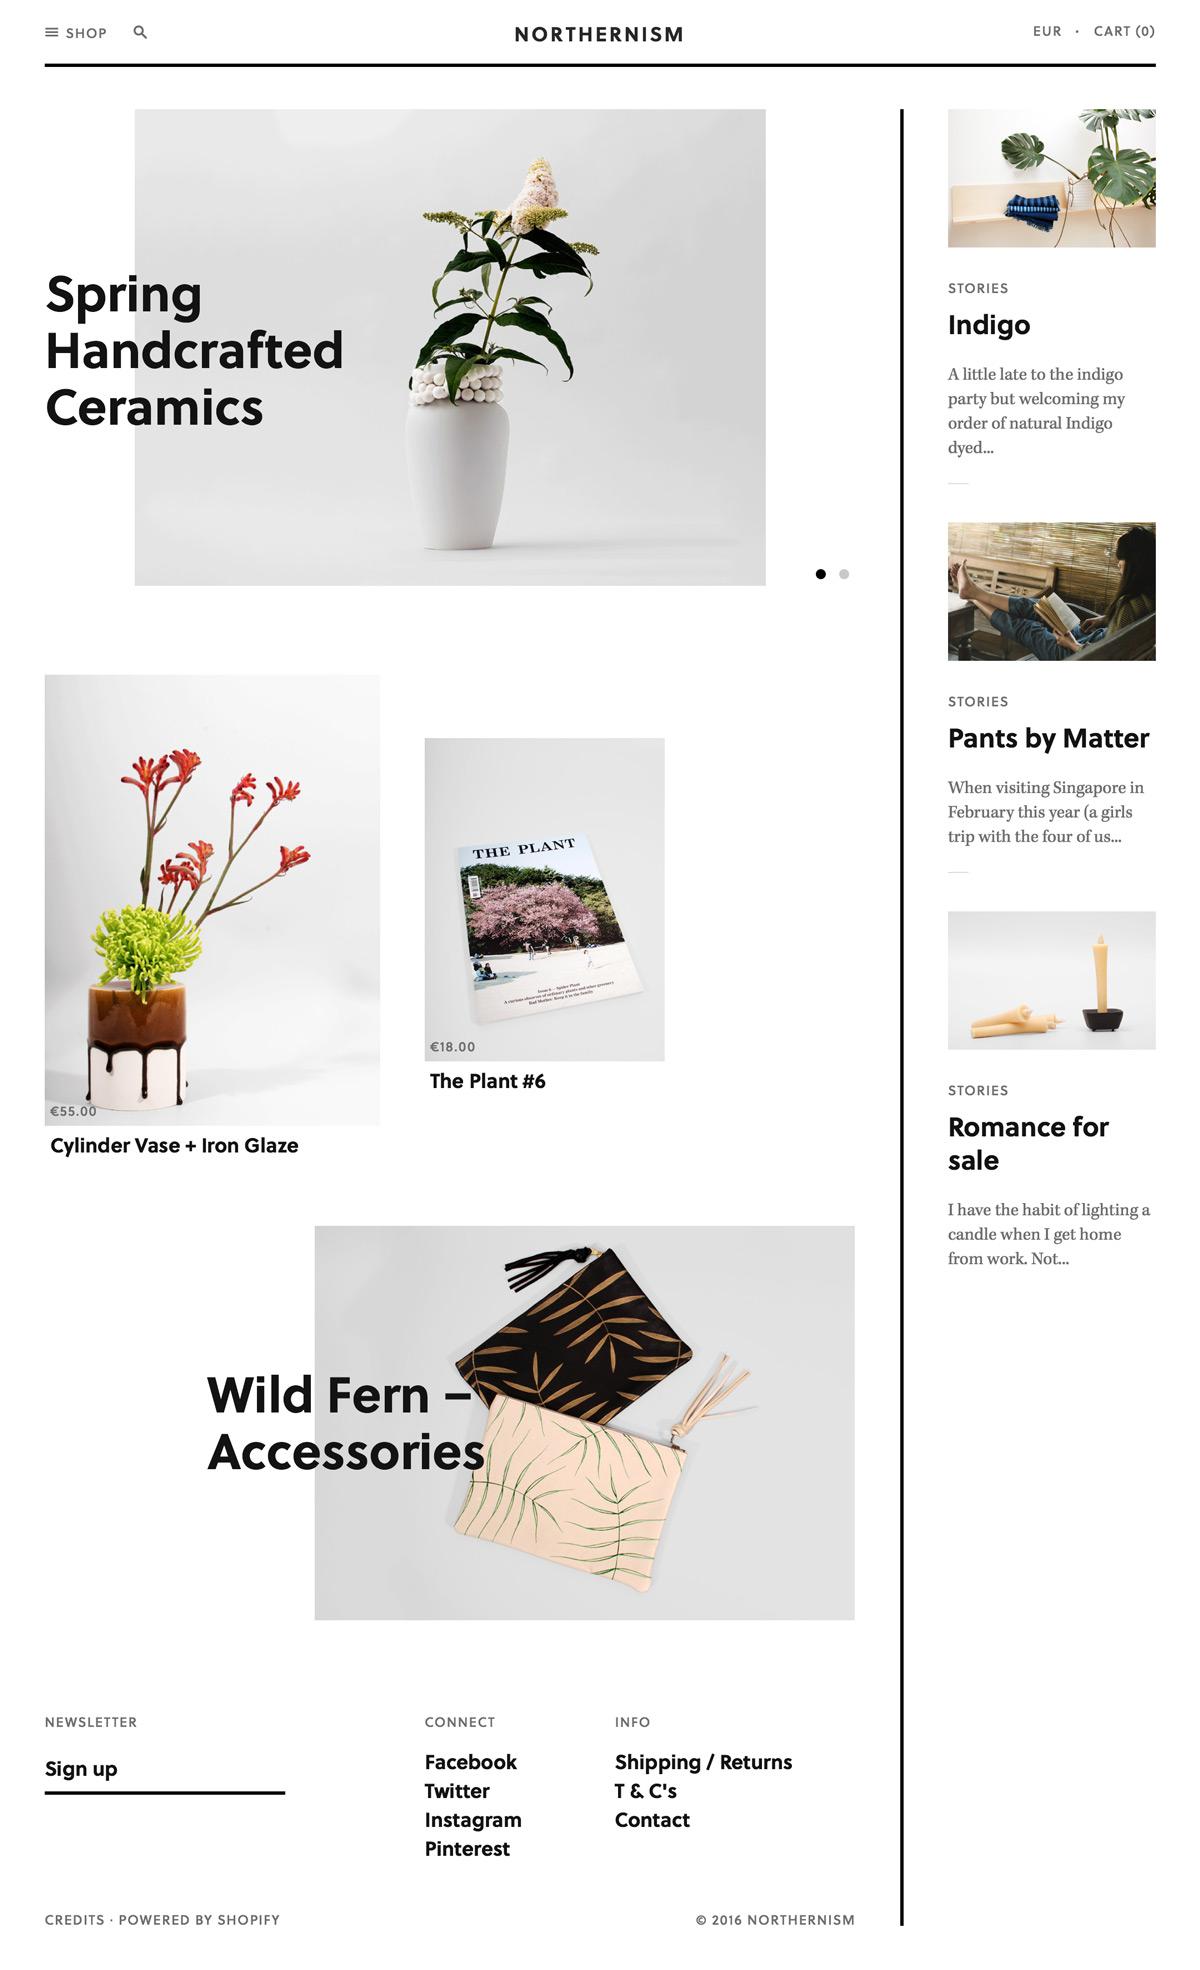 eCommerce website: Northernism